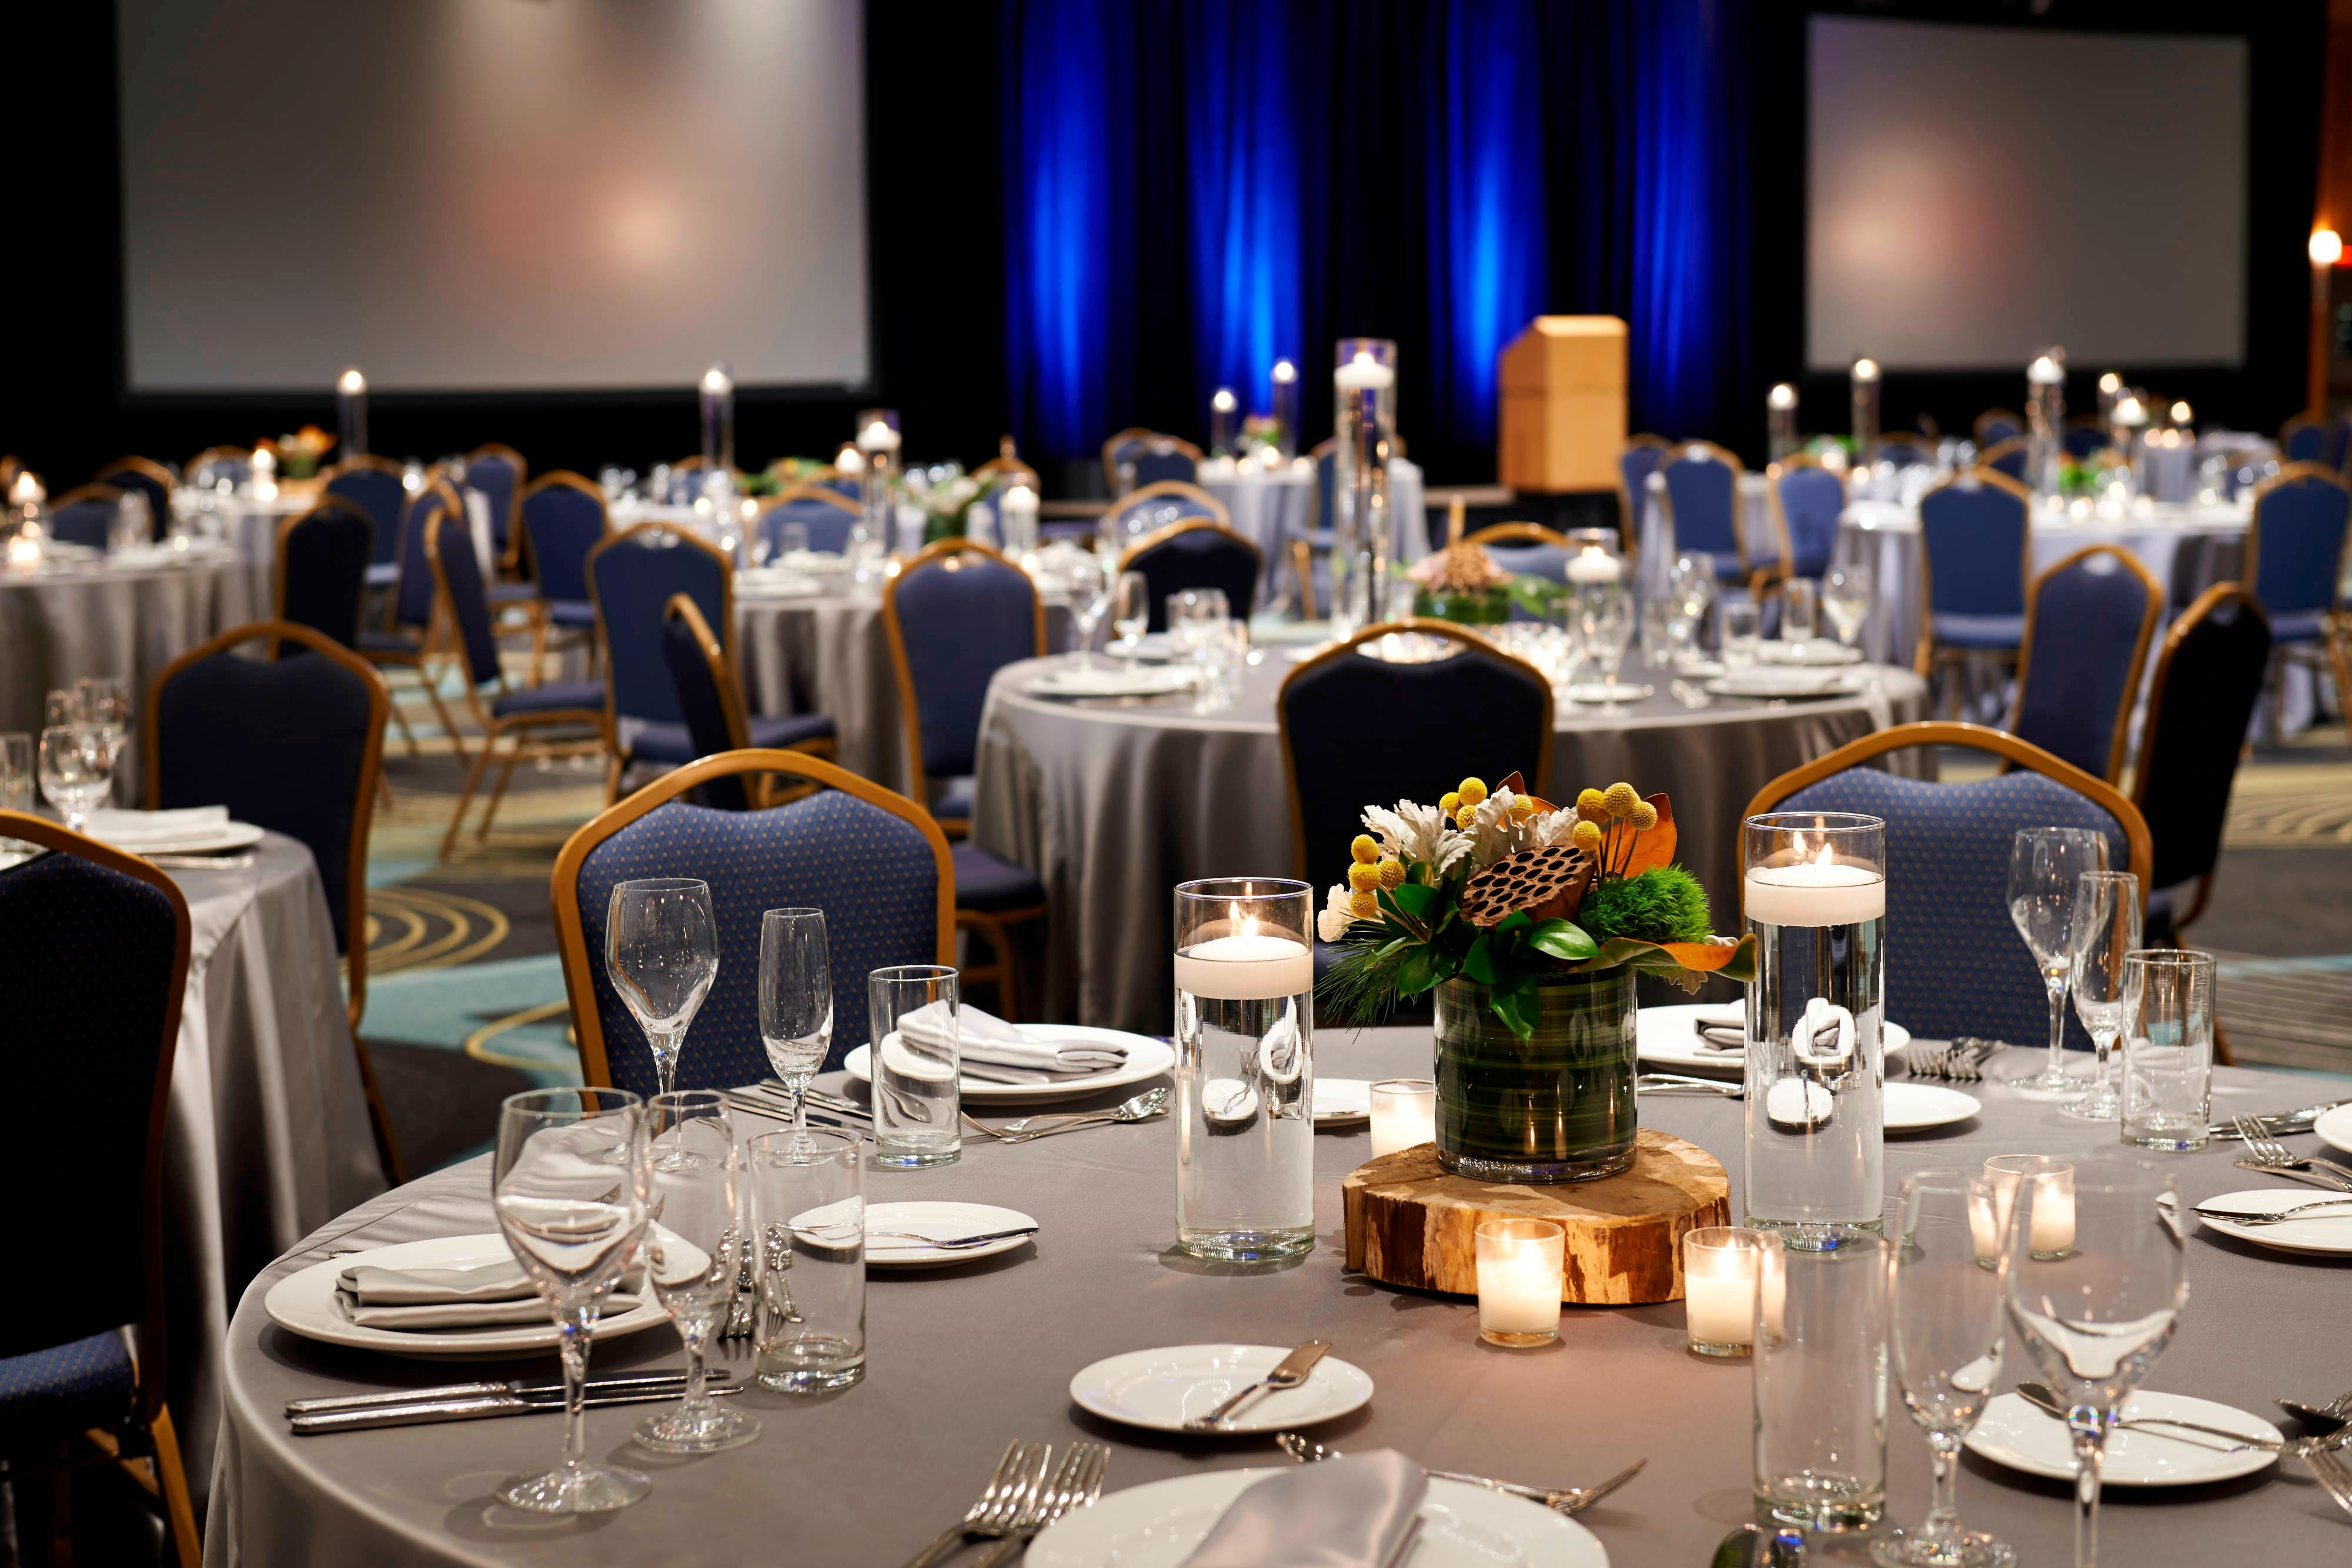 Detroit Luxury Hotel Events